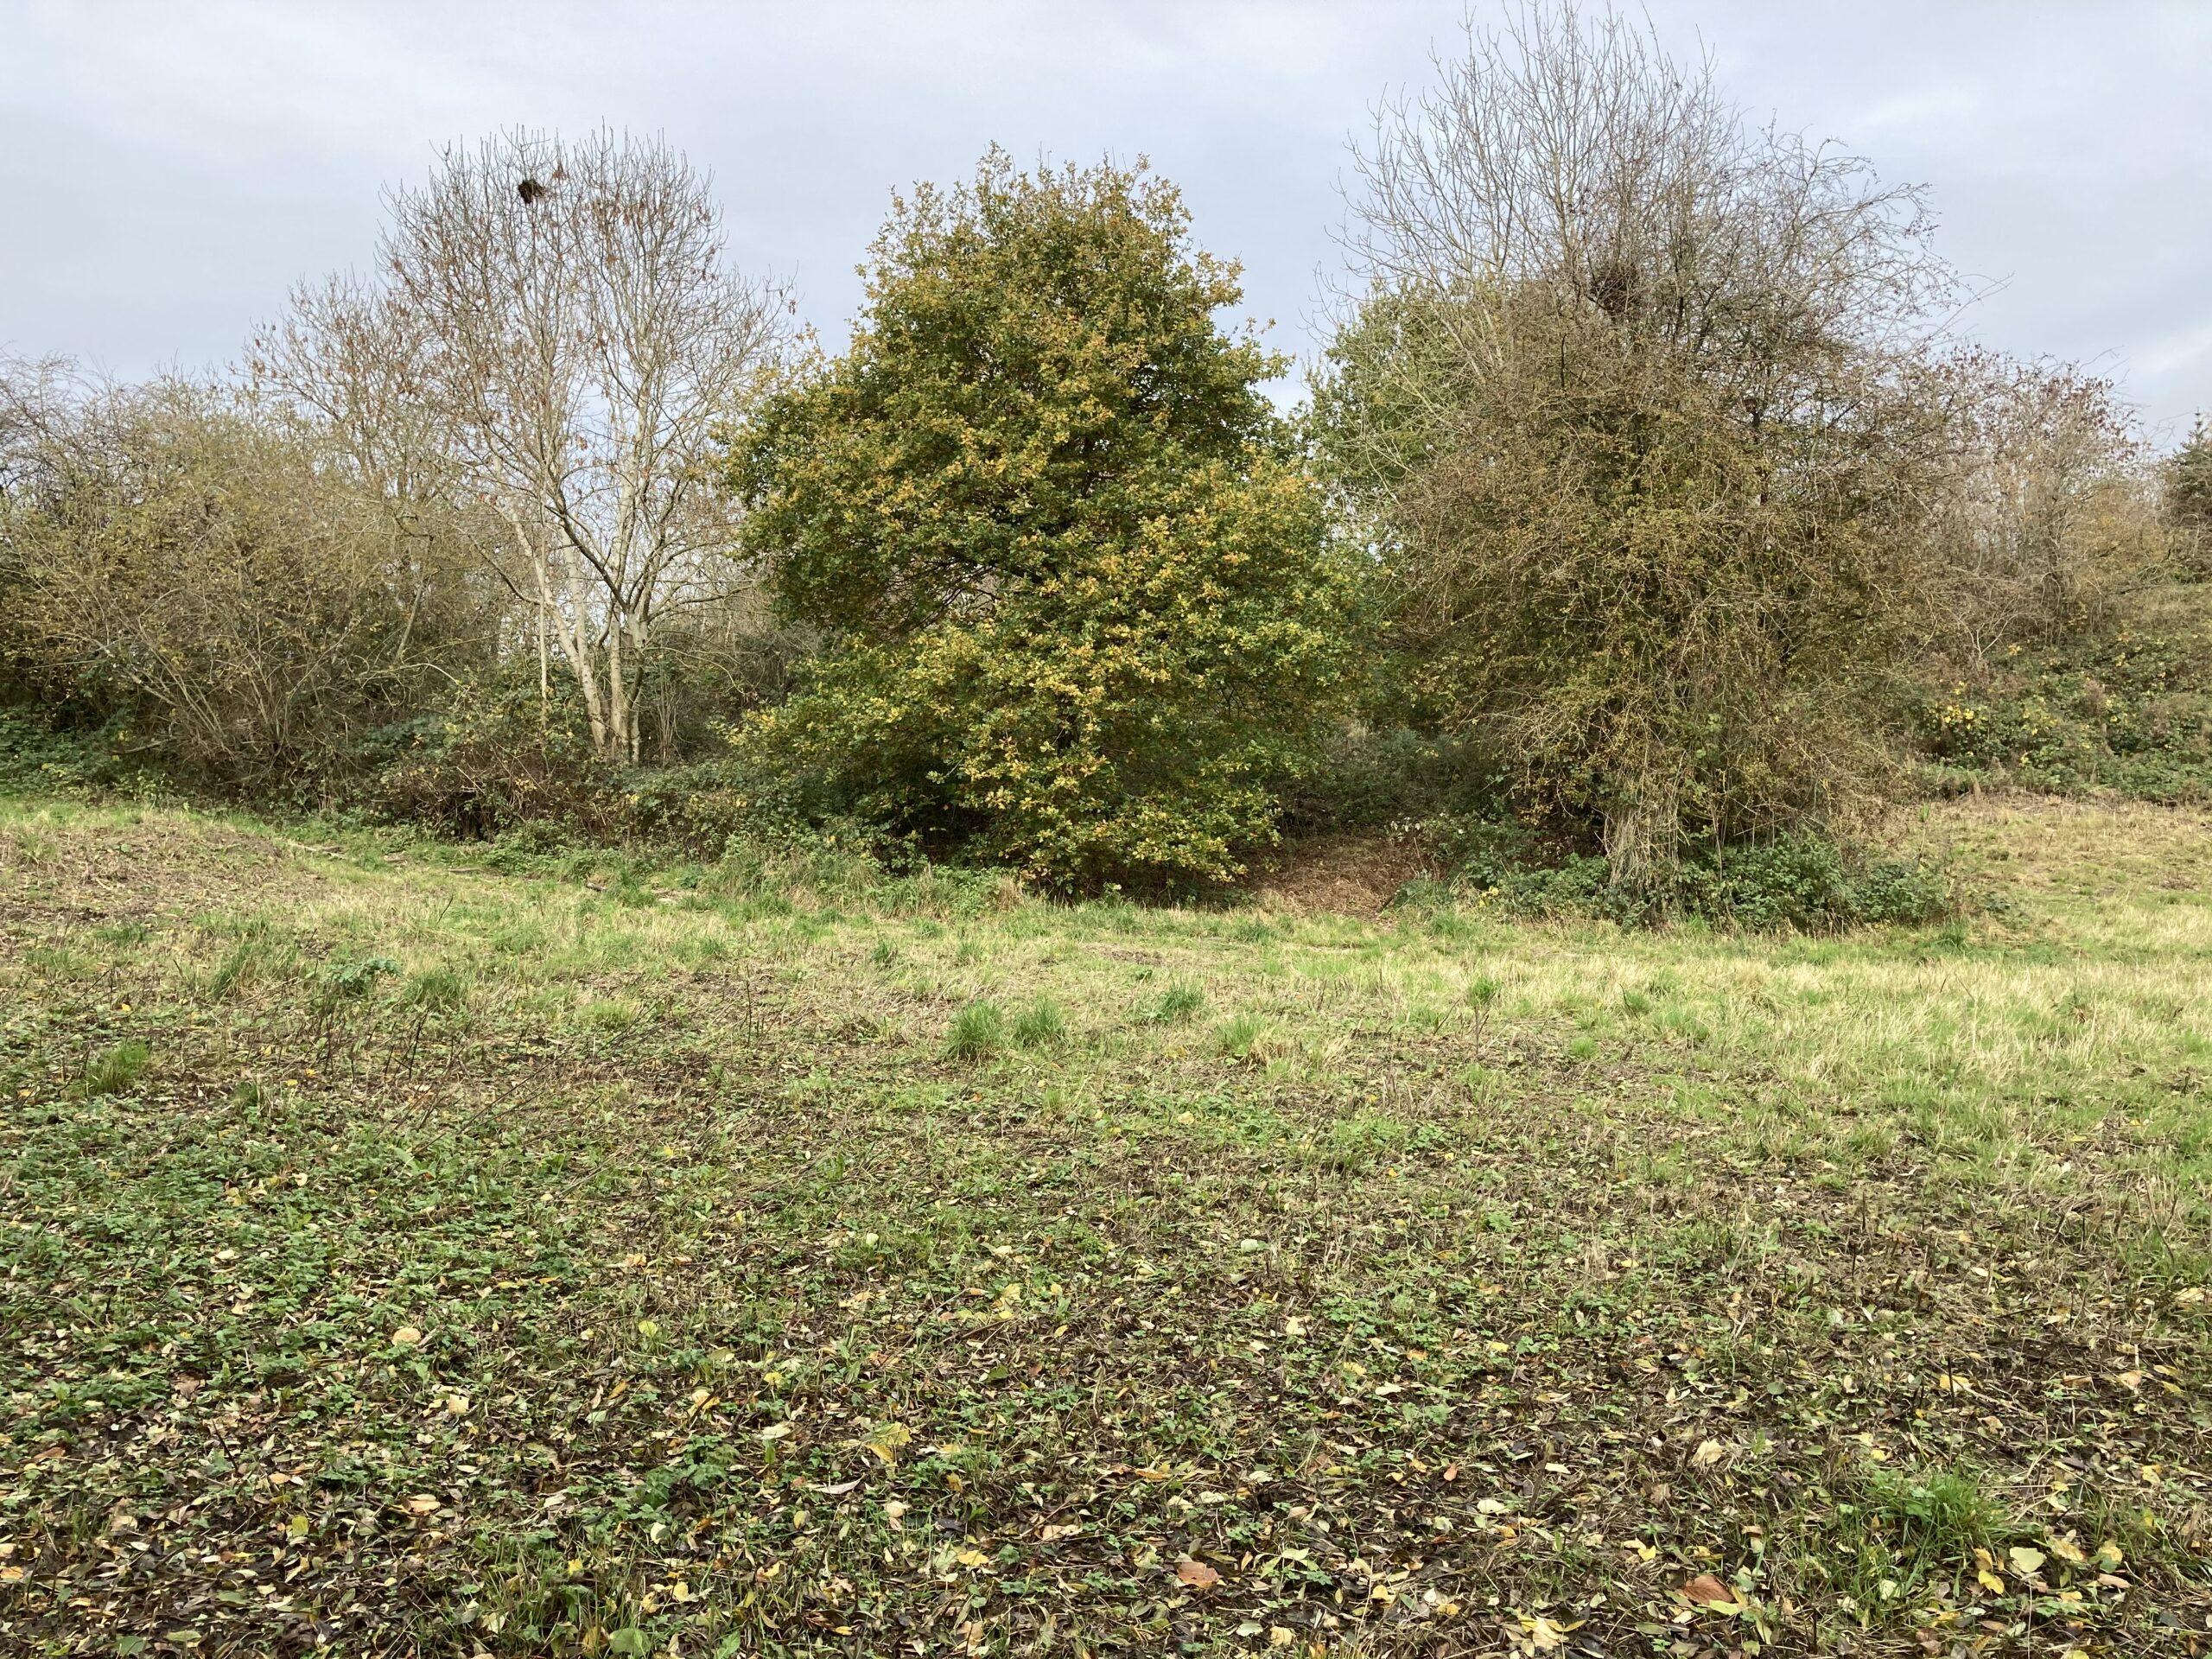 The Meadow - November